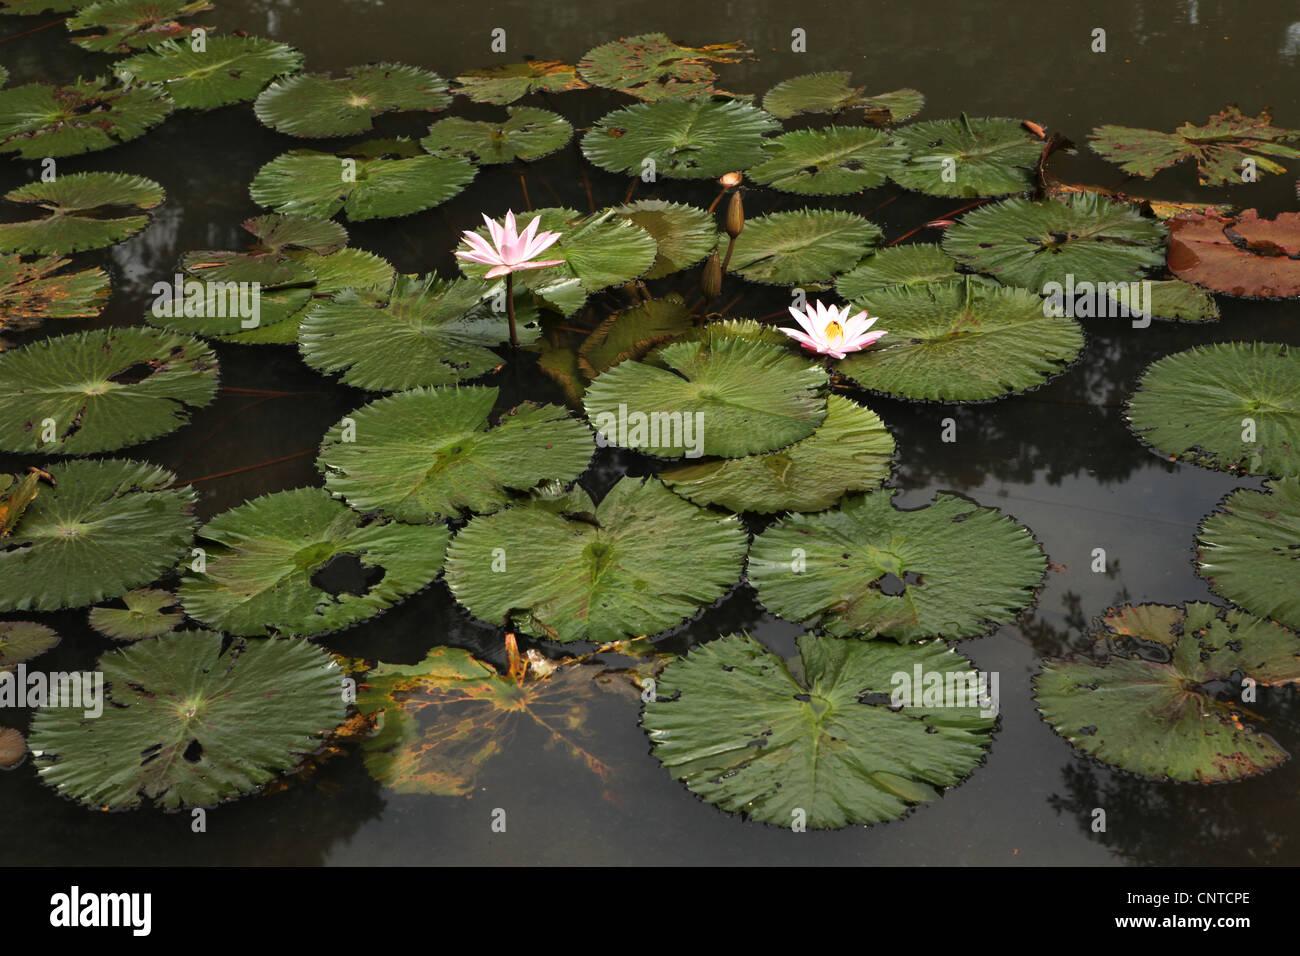 Lotus nel Giardino Botanico Bogor, West Java, Indonesia. Immagini Stock